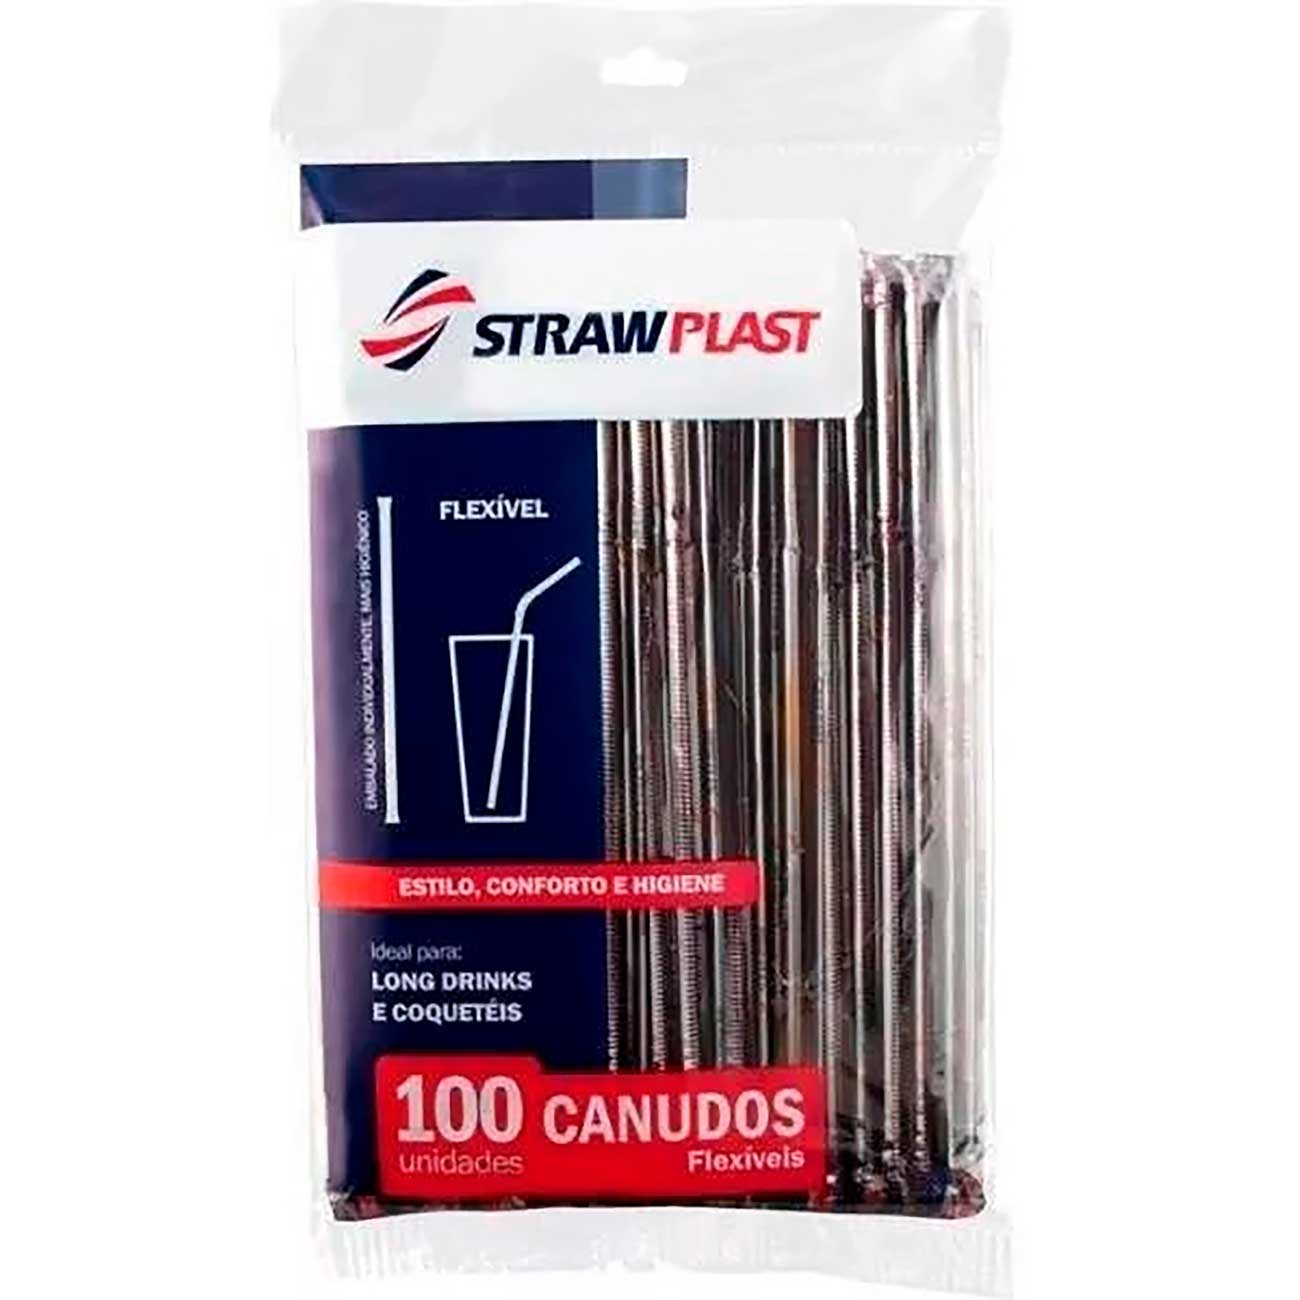 Canudo Strawplast Sach� Flex�vel Preto - Cs-313